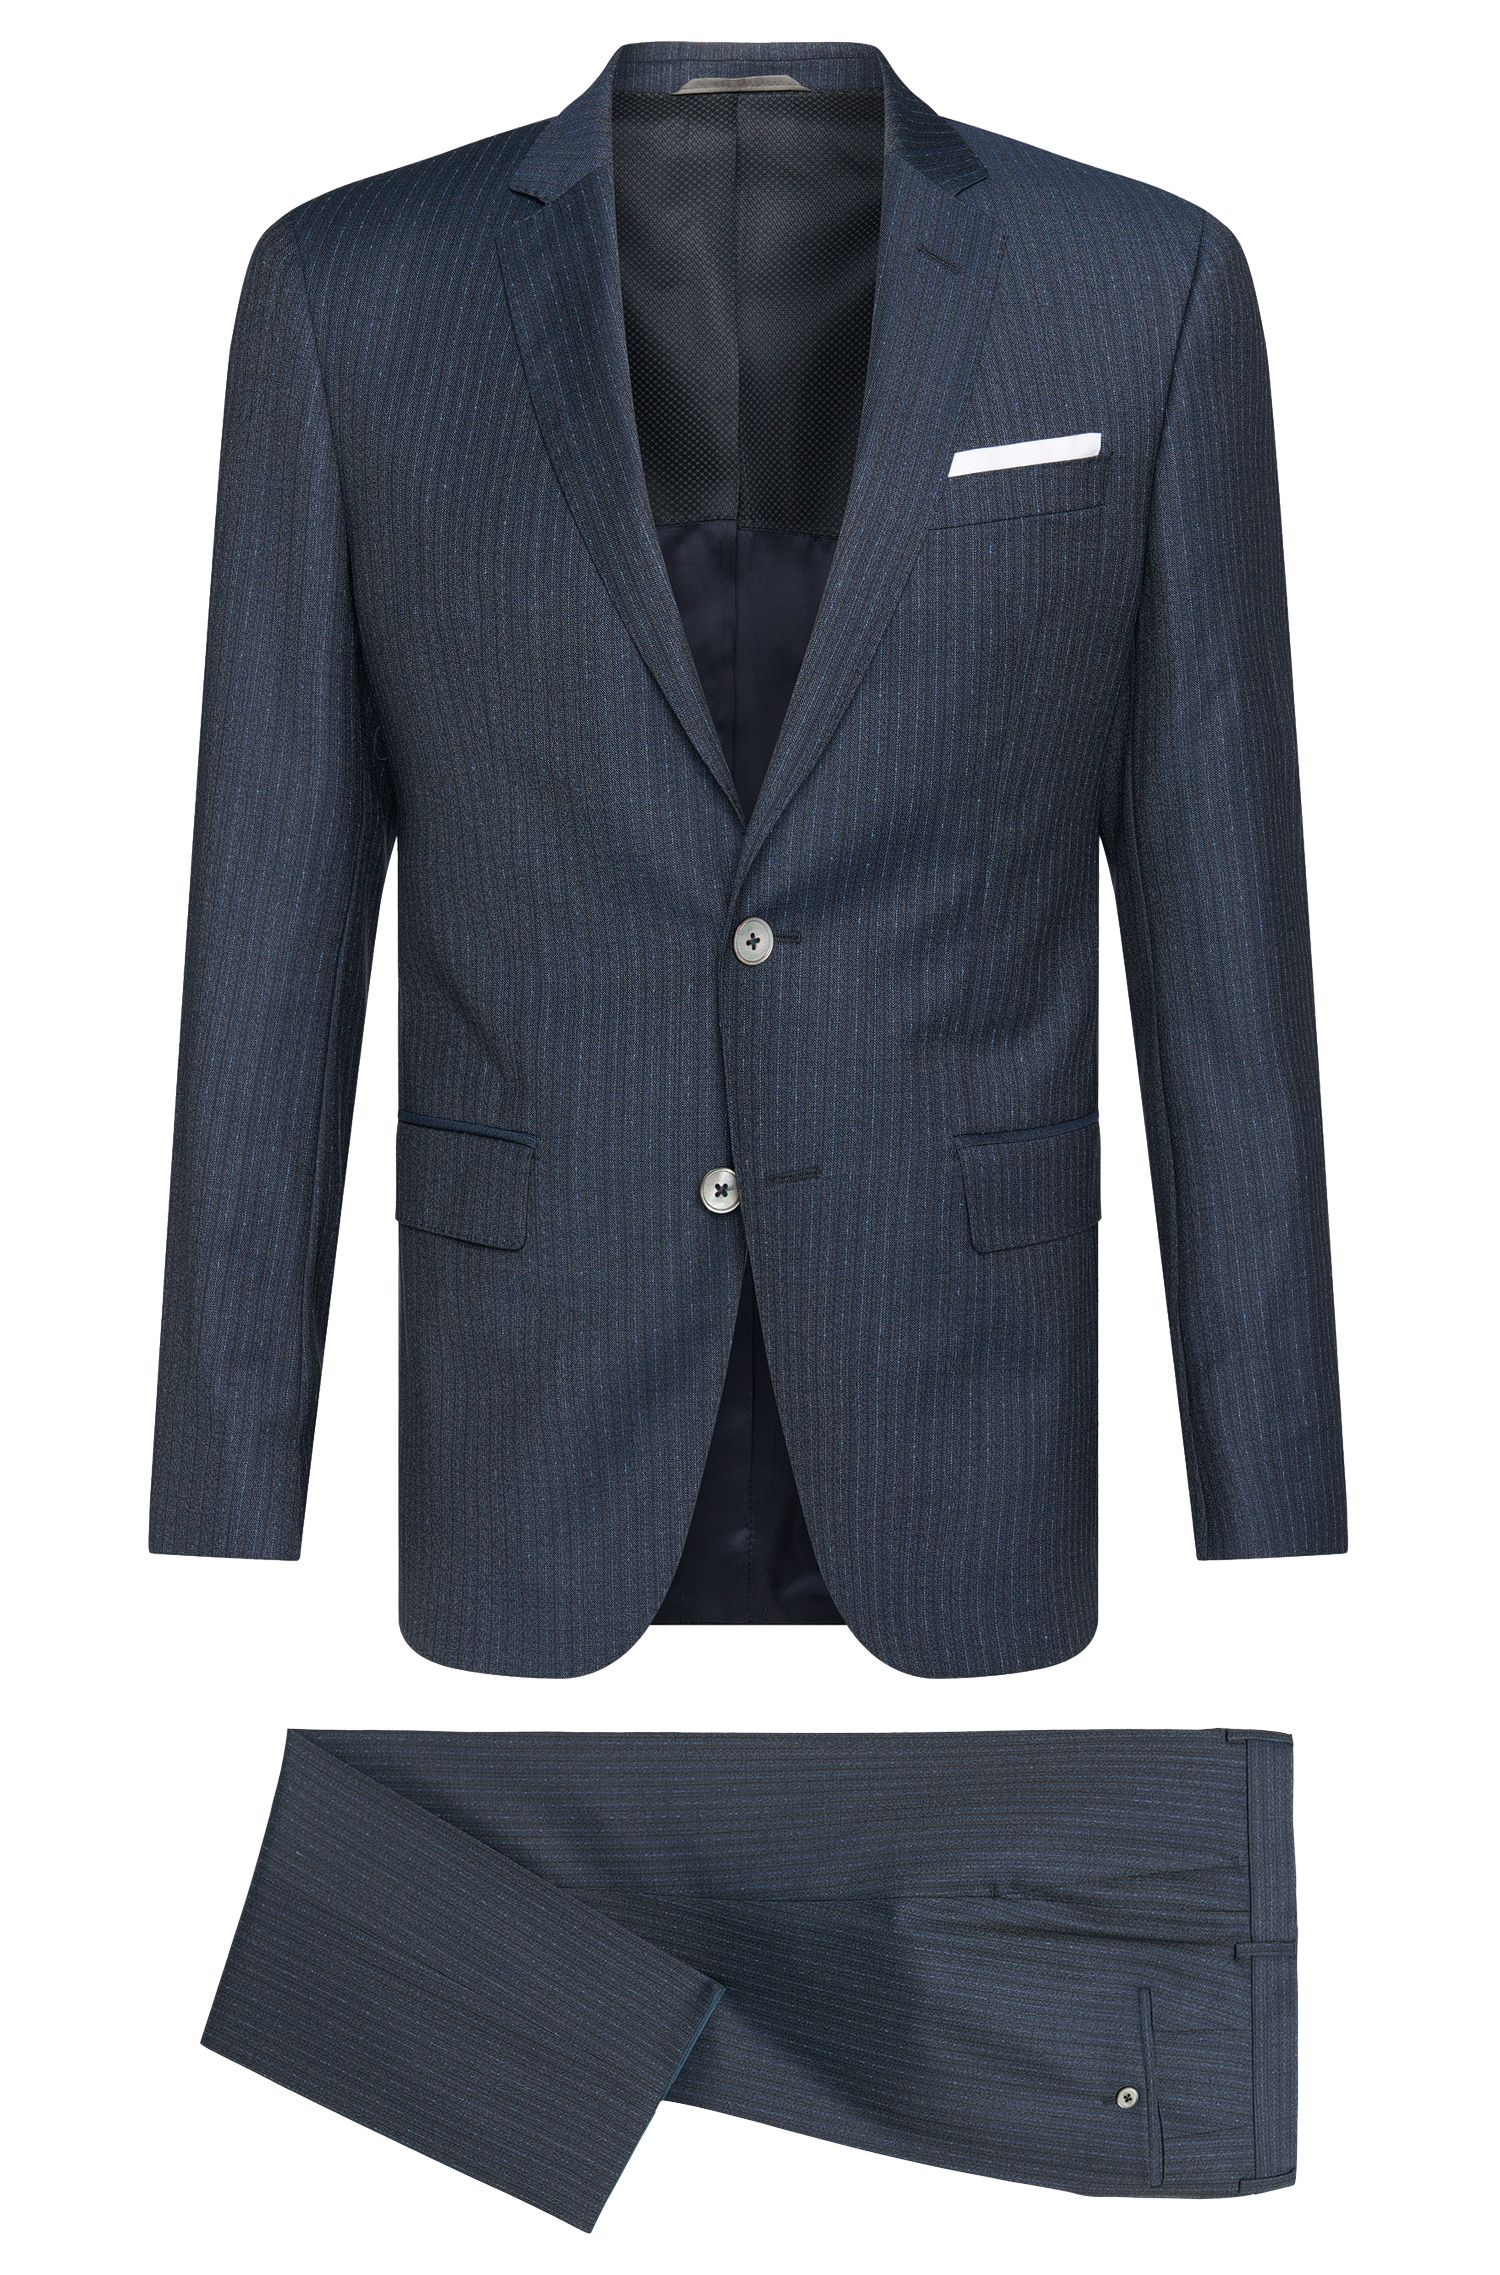 'Hutson/Gander' | Slim Fit, Super 100 Italian Virgin Wool Suit